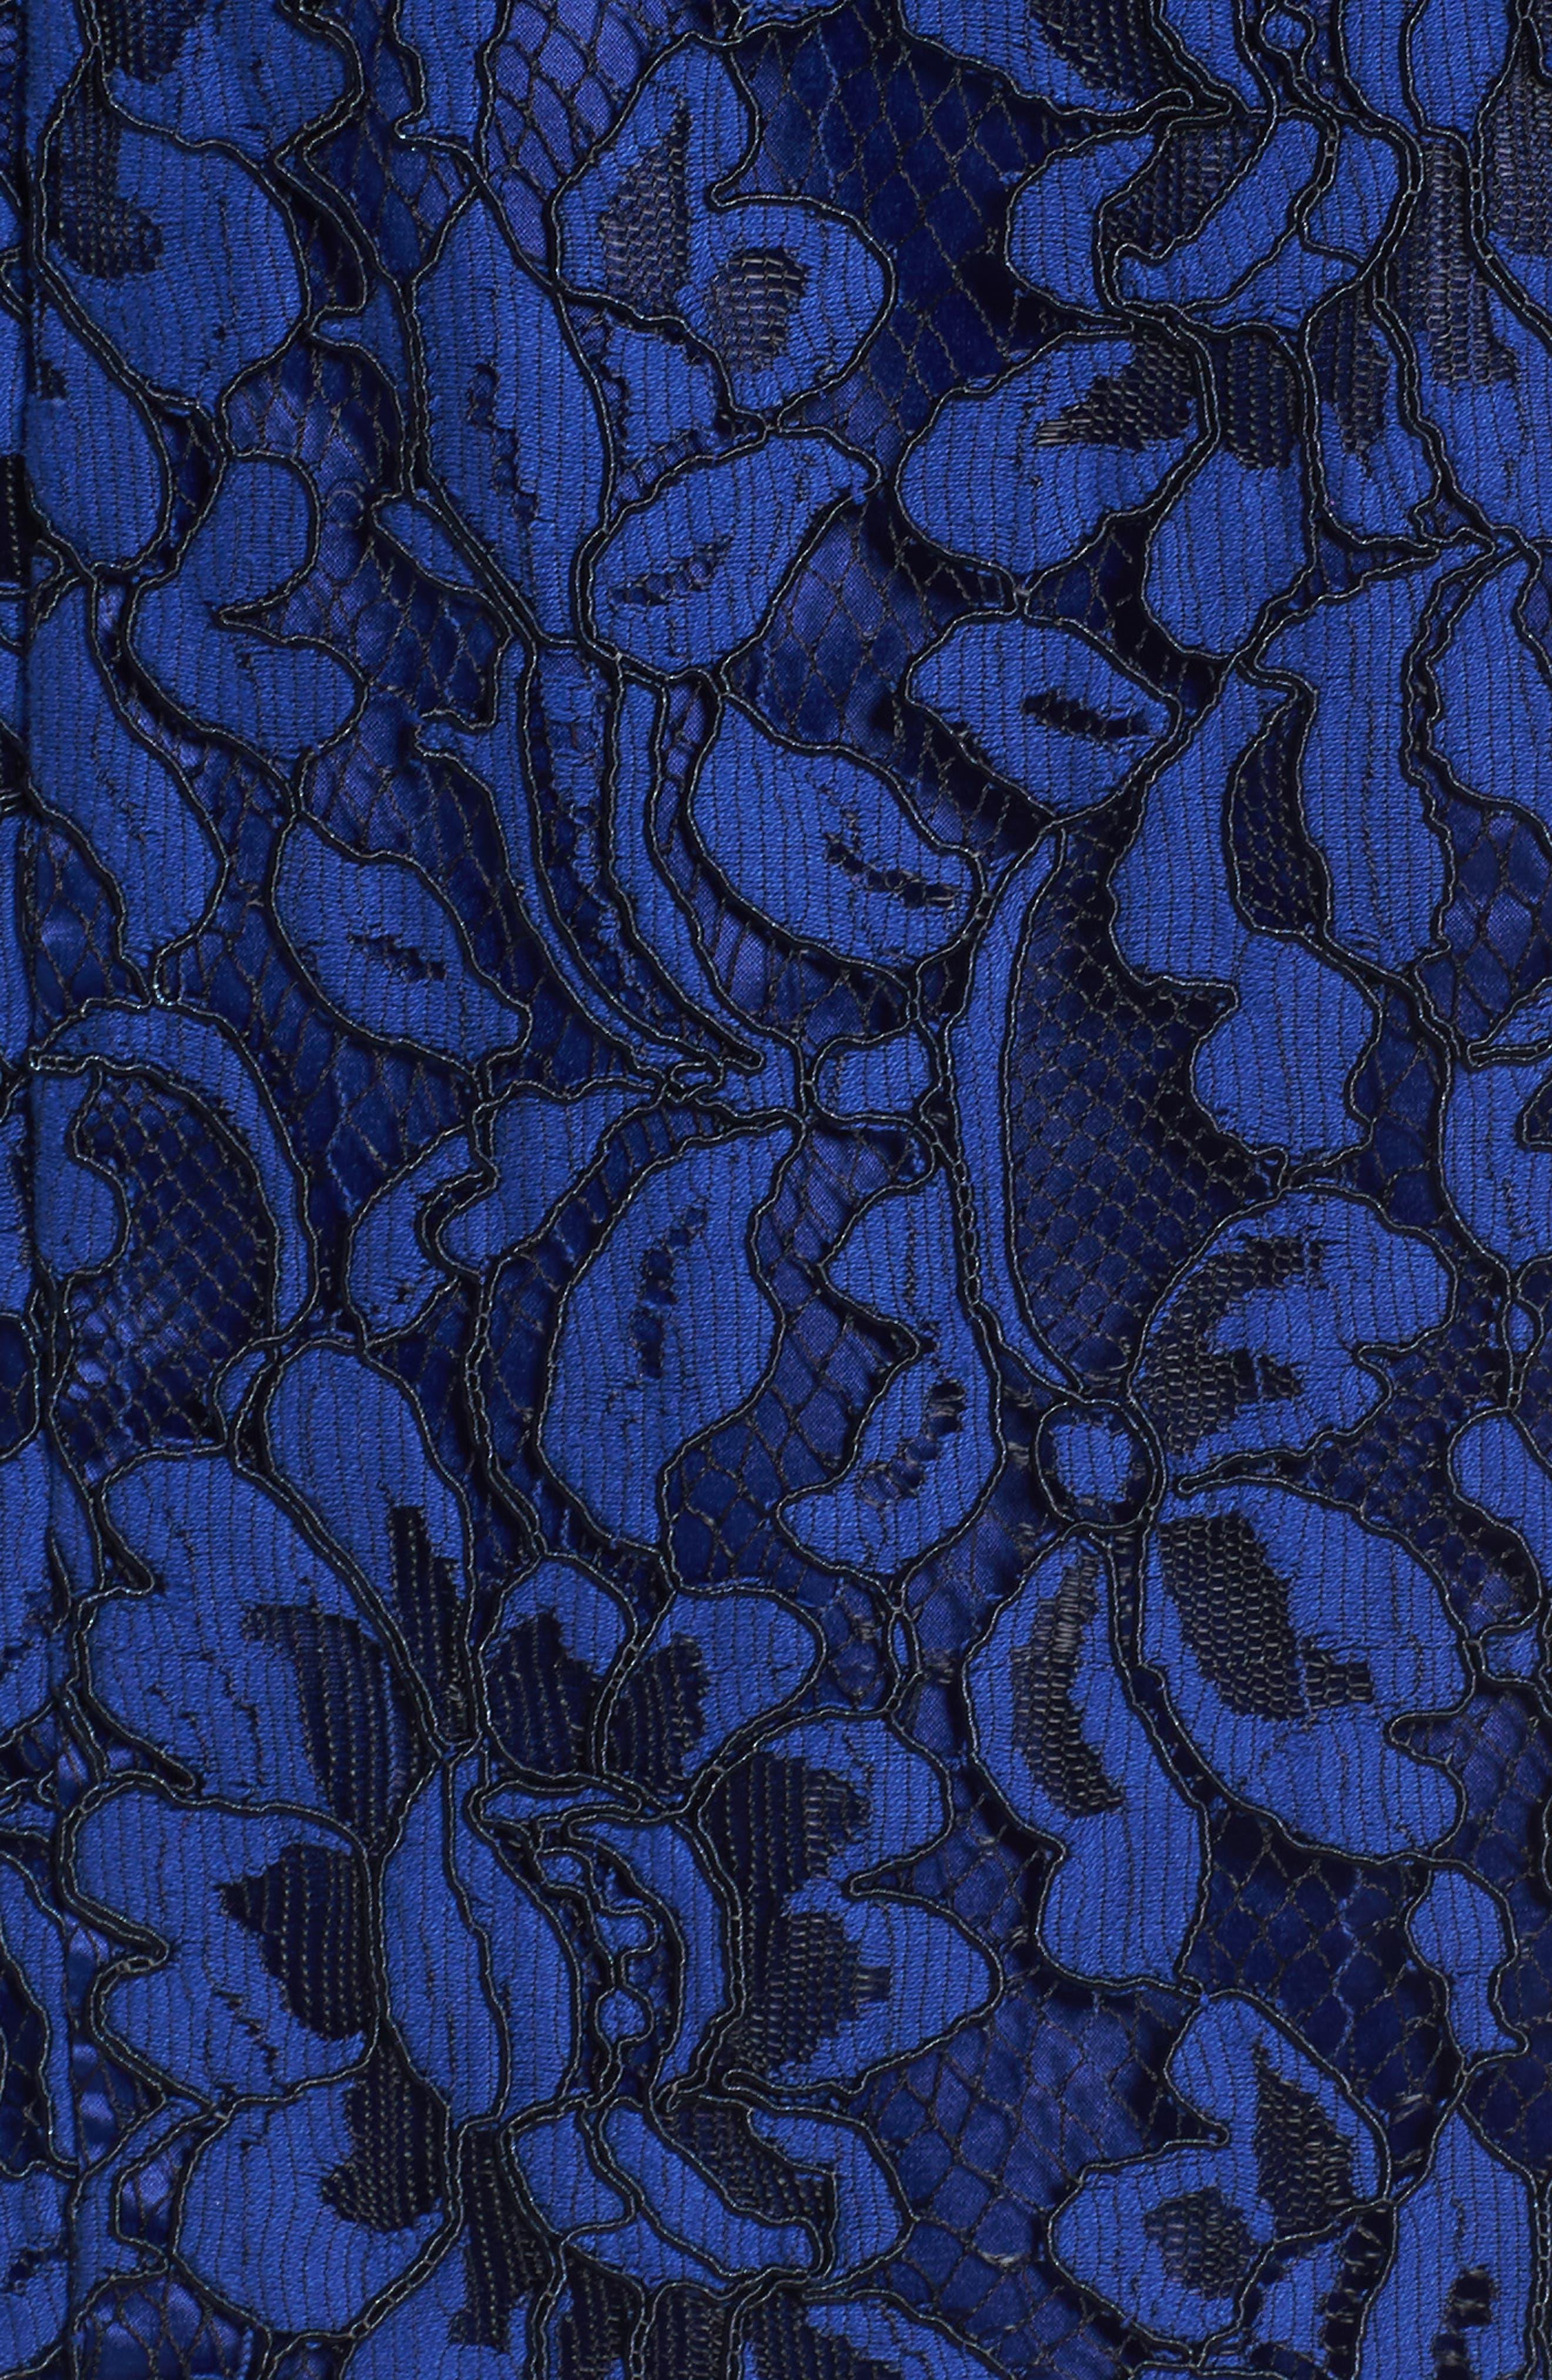 Bell Sleeve Lace Sheath Dress,                             Alternate thumbnail 5, color,